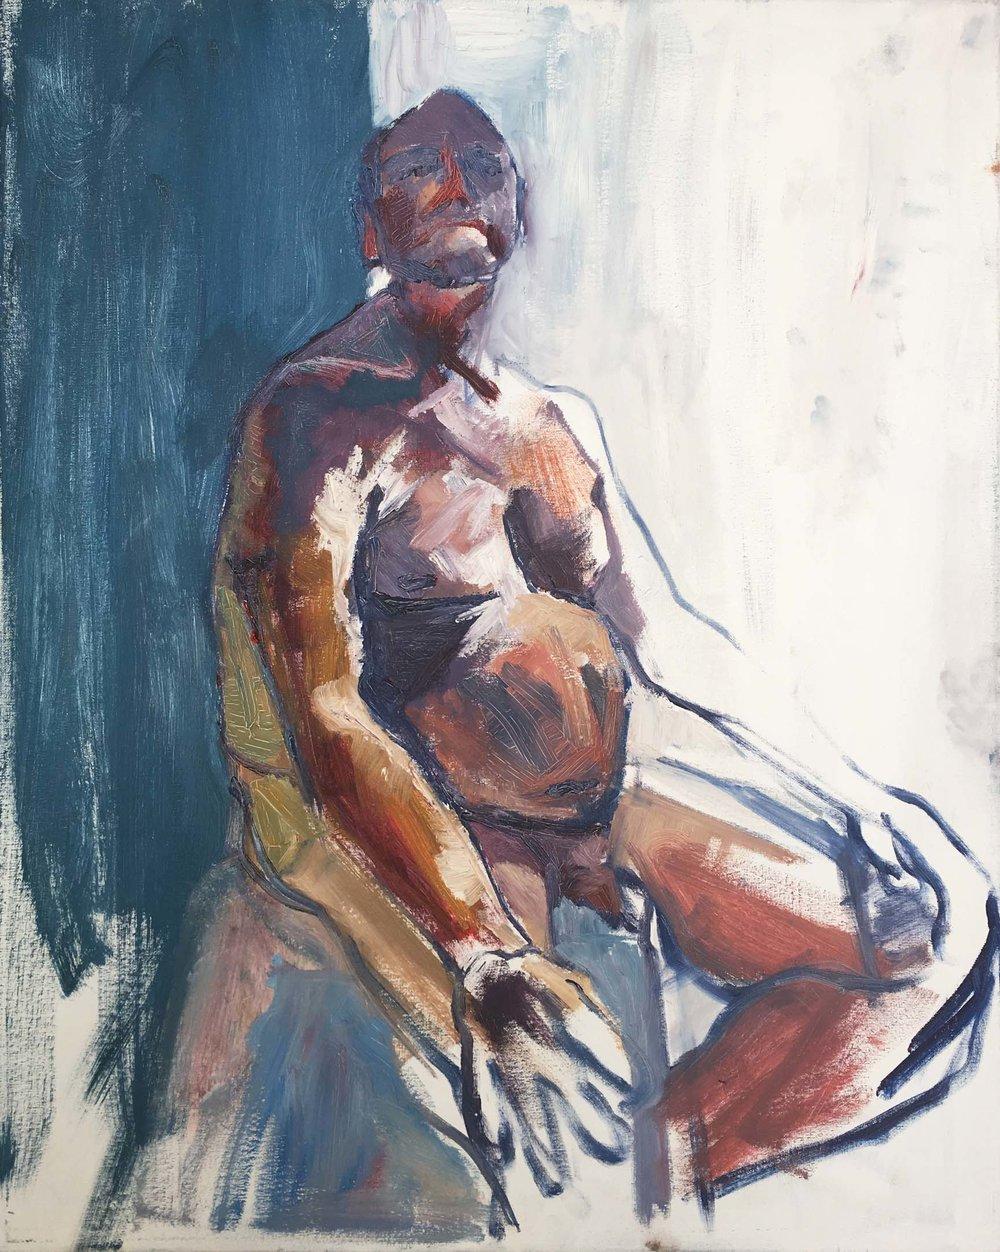 Barry, 2017. Oil on canvas, w61 x h76cm (w65 x h80cm framed).